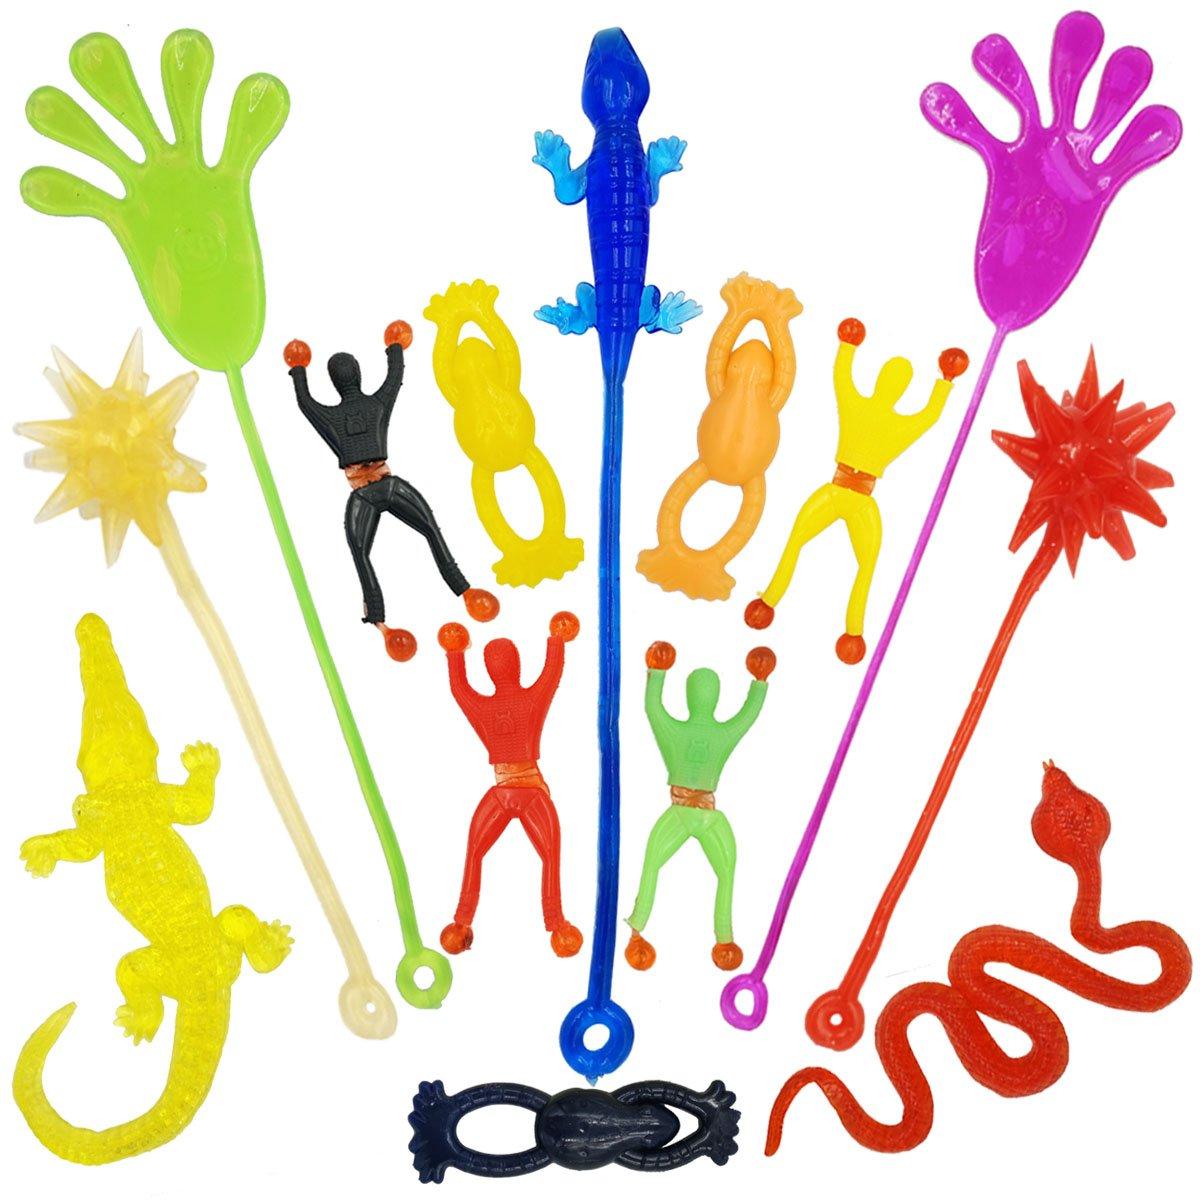 Snakes Cheap Toy Deals SnakesFind Line Big At On lF13TKJ5cu